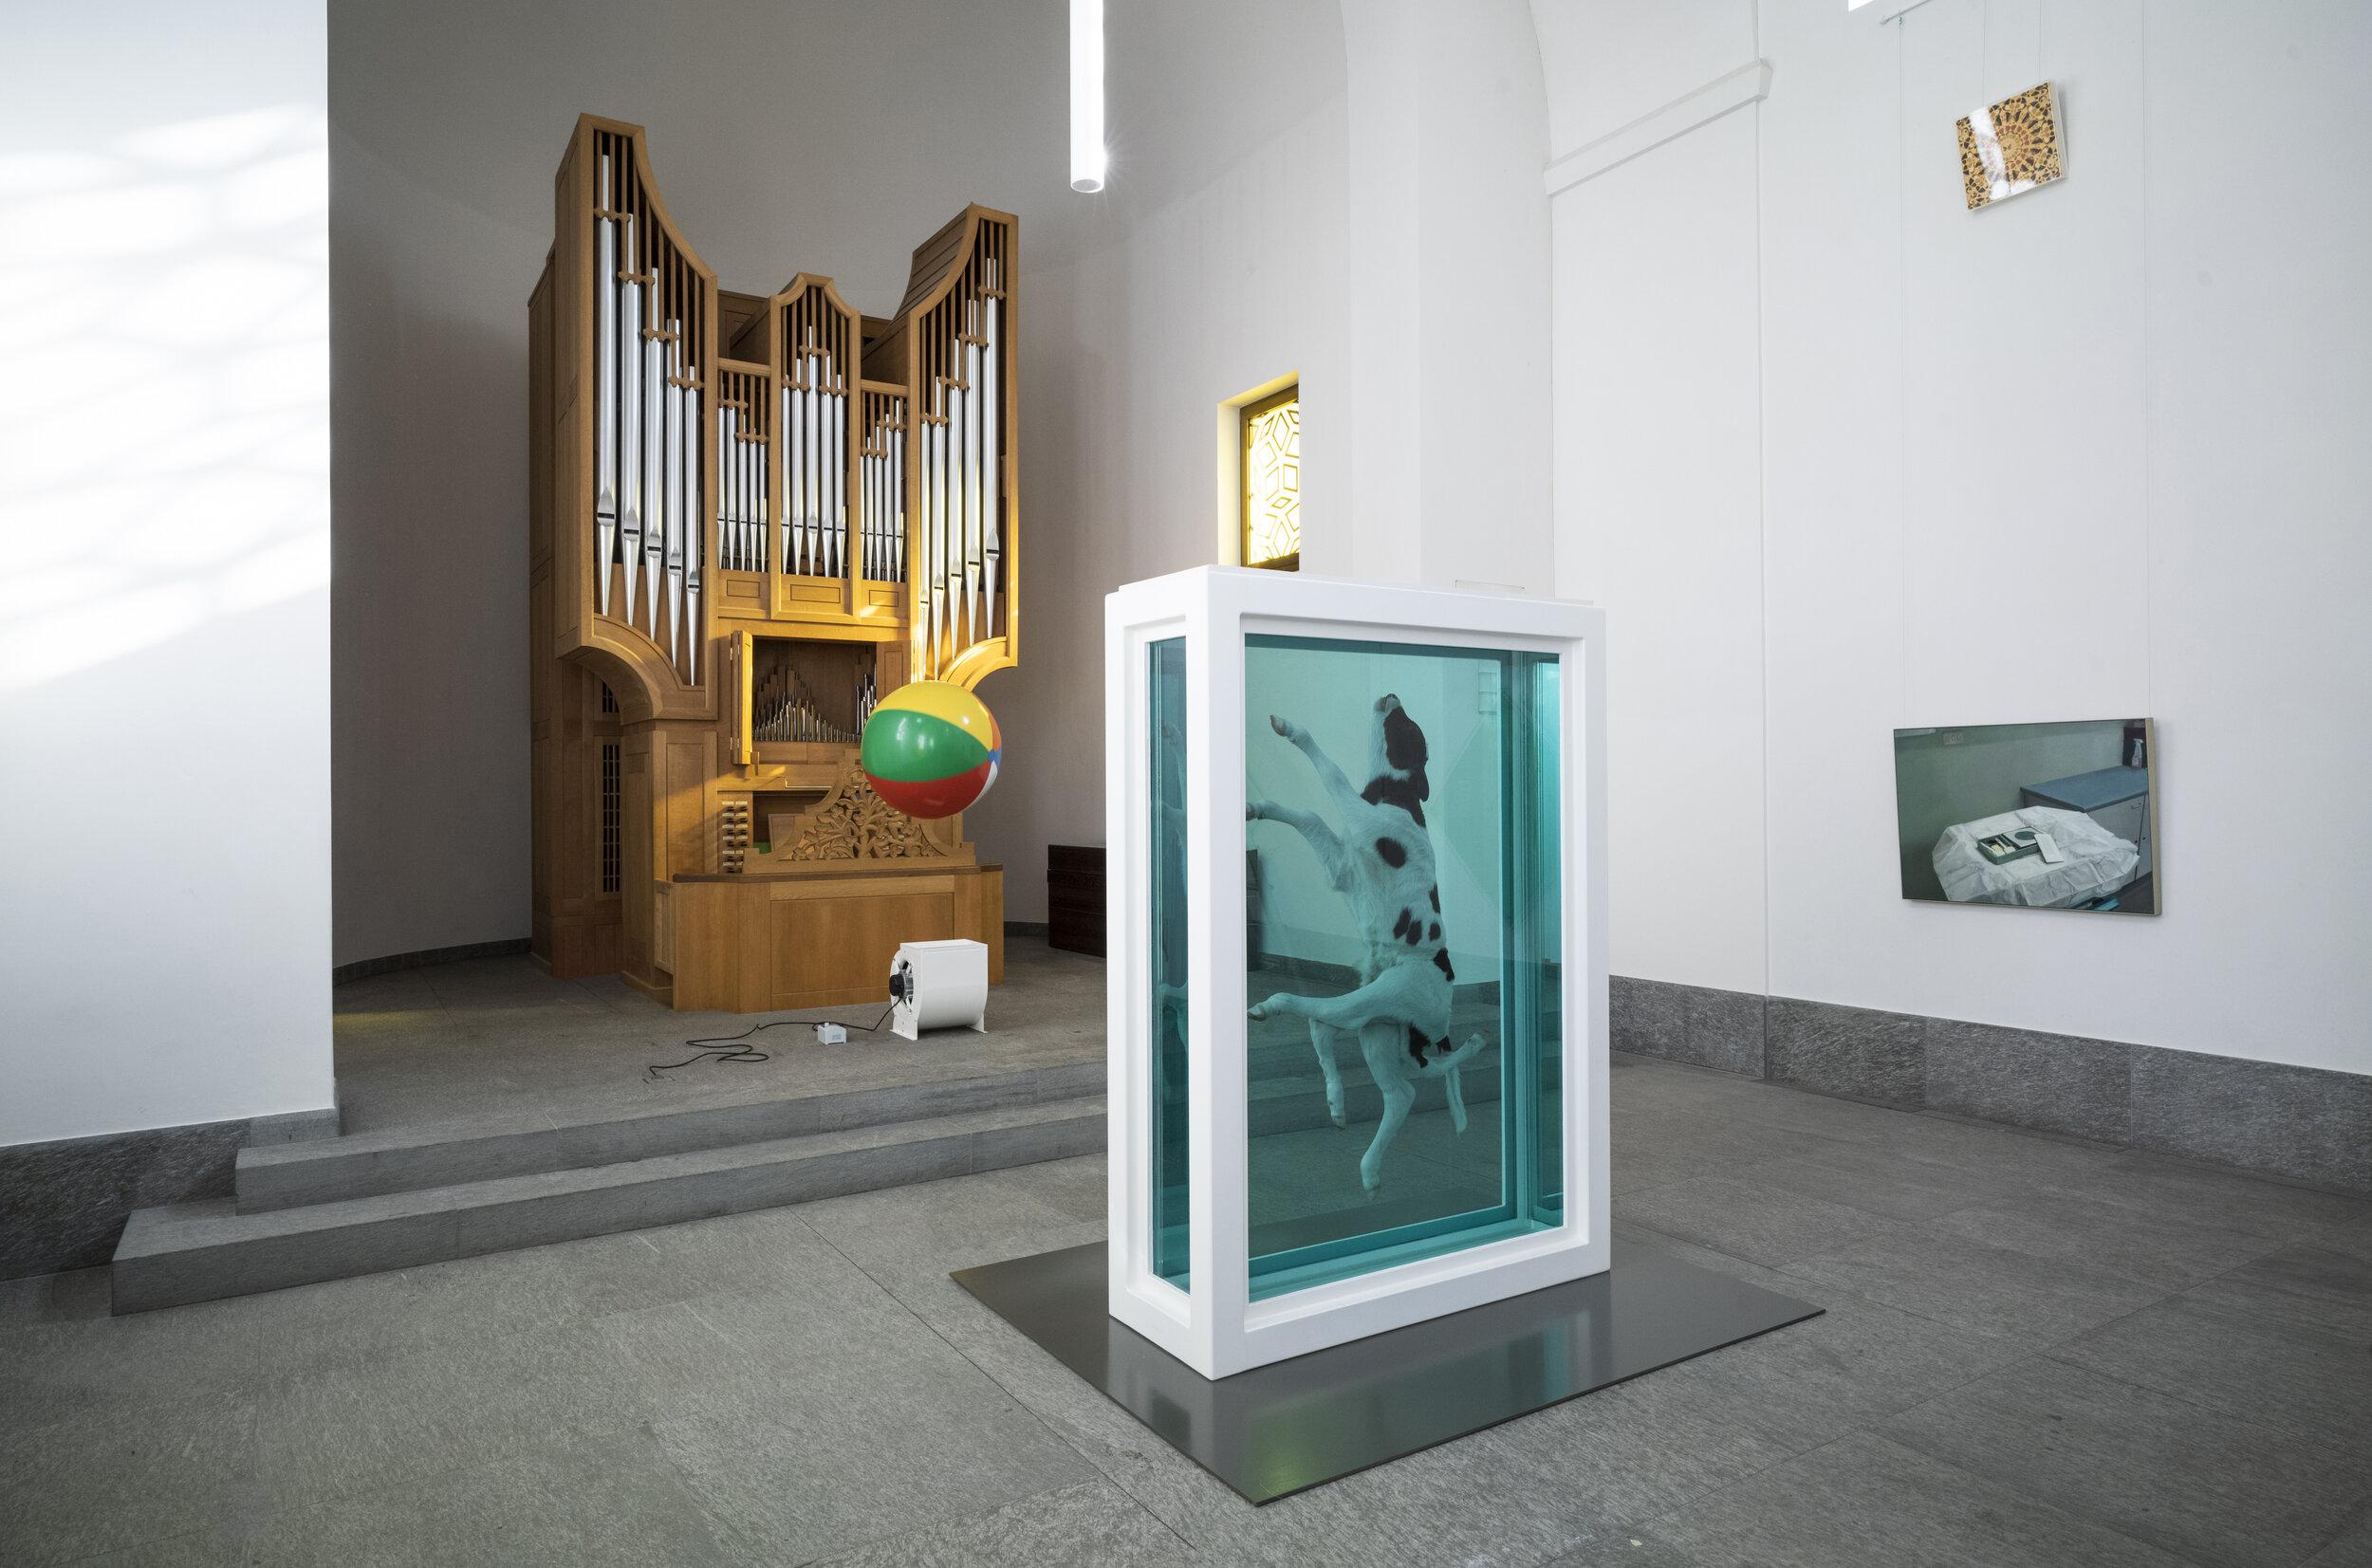 Damien Hirst, Protestant Church, St. Moritz Dorf, 2021, St Moritz (1)